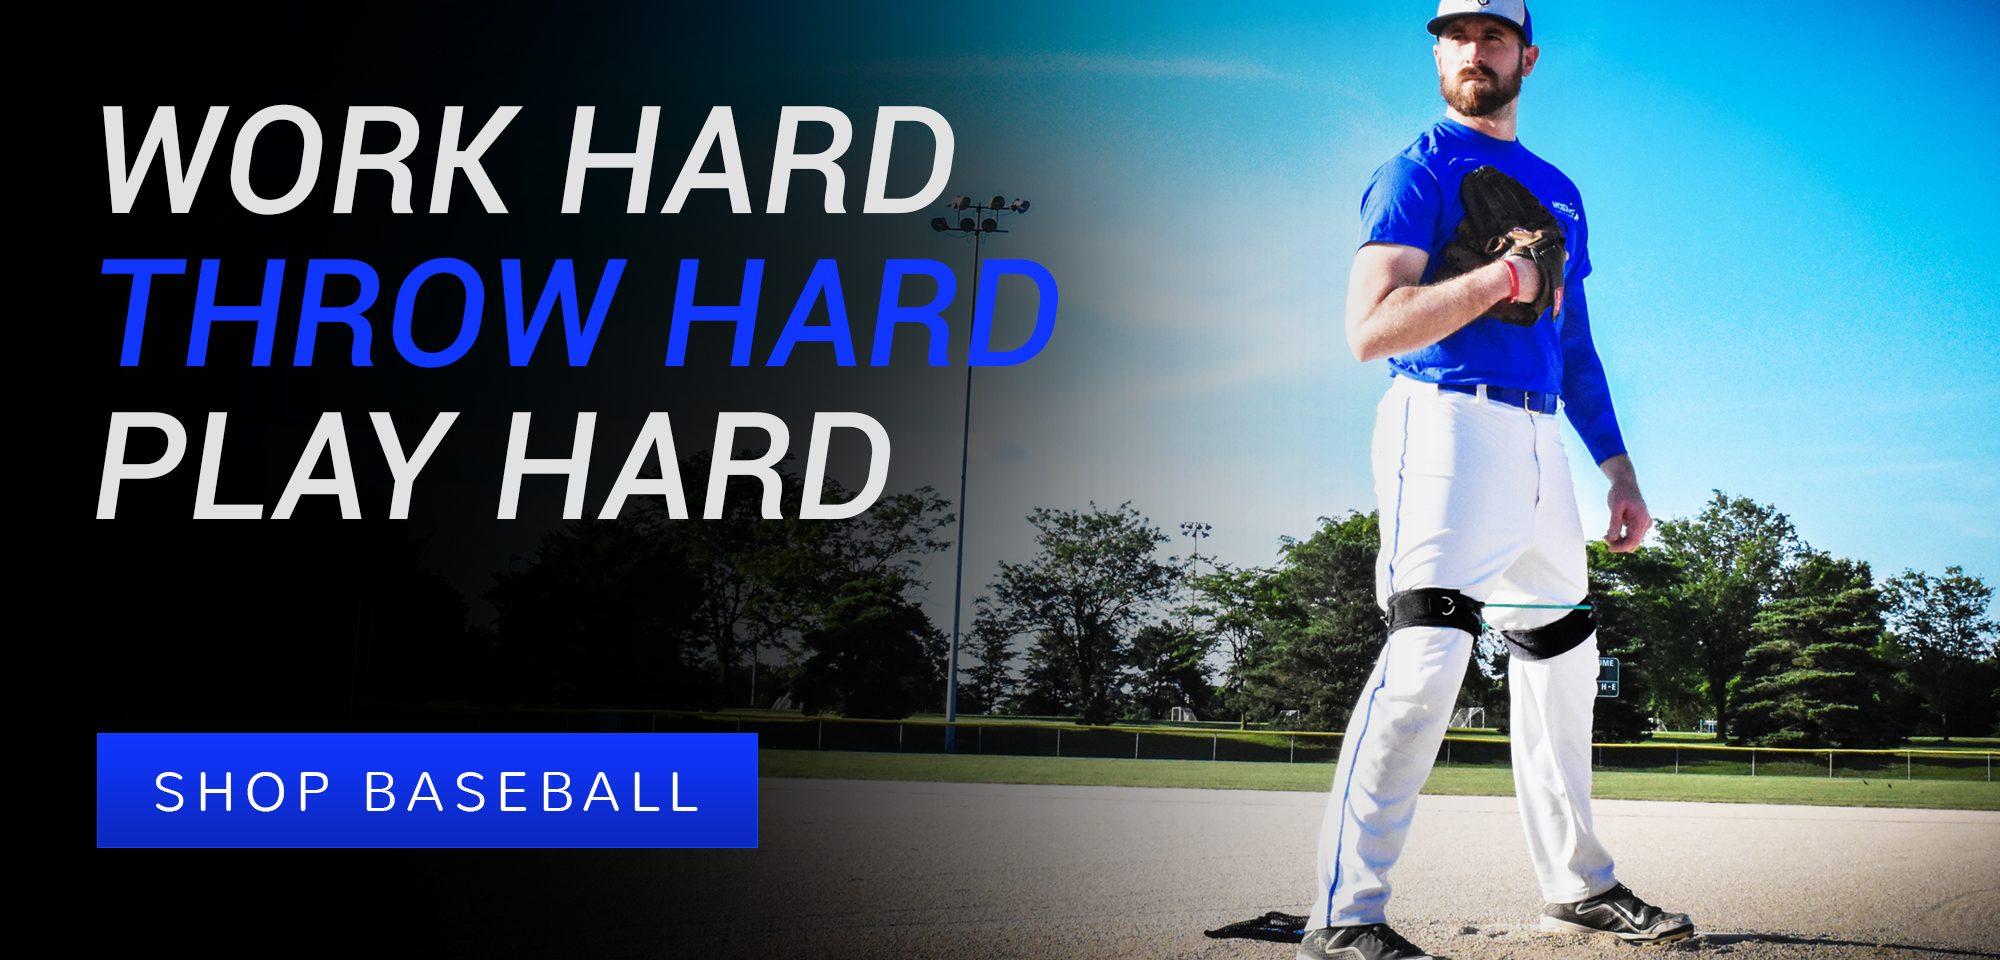 Work Hard, Throw Hard, Play Hard - Shop Baseball and Softball